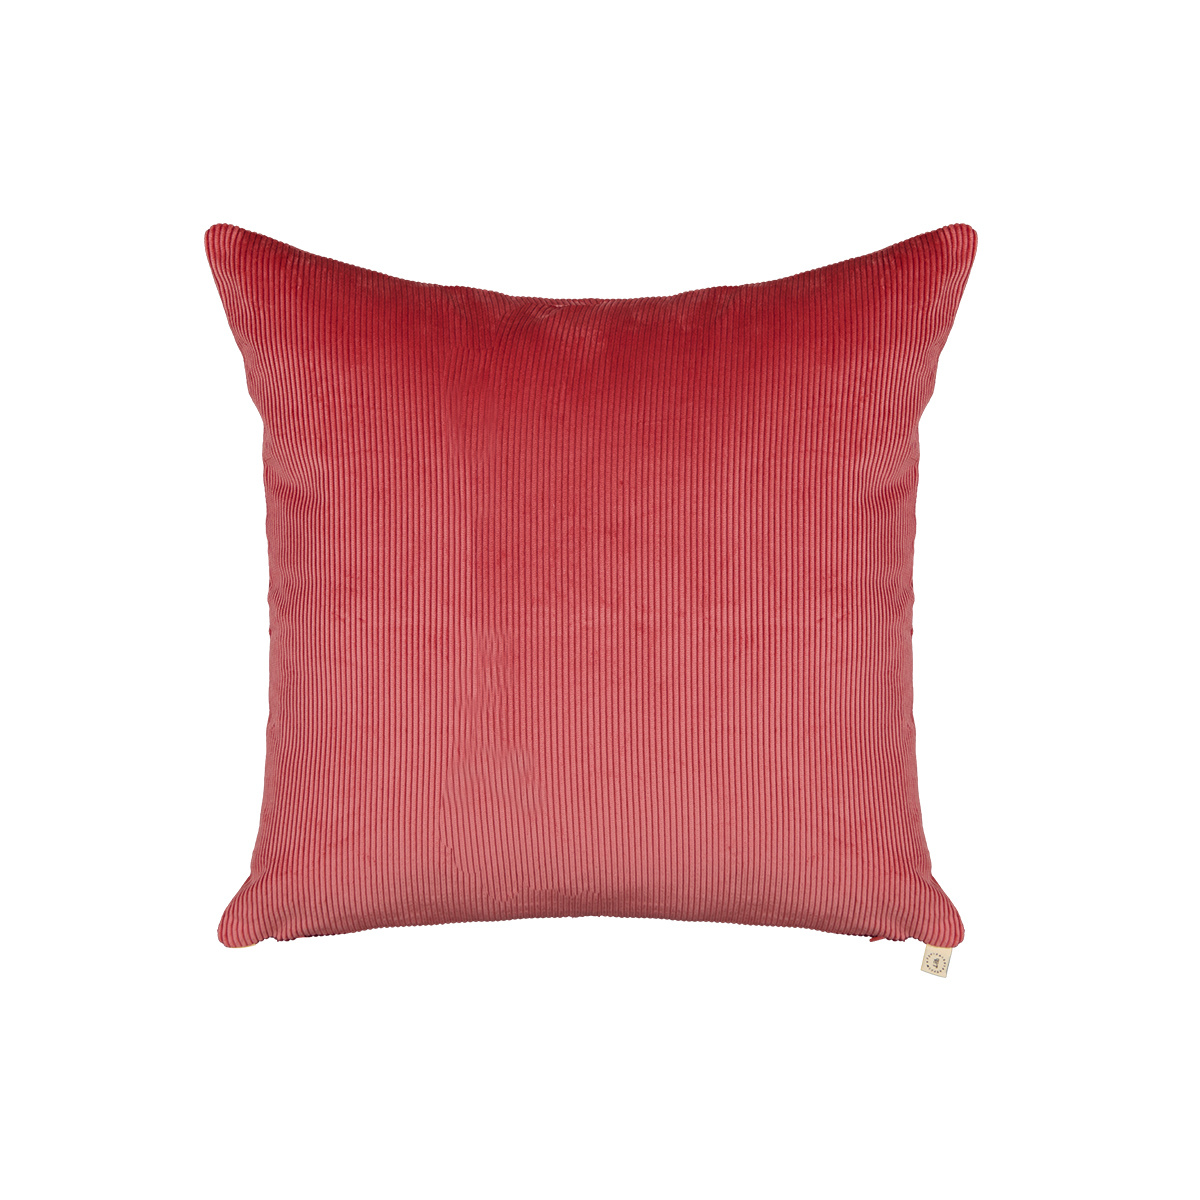 Carino pink corduroy cushion